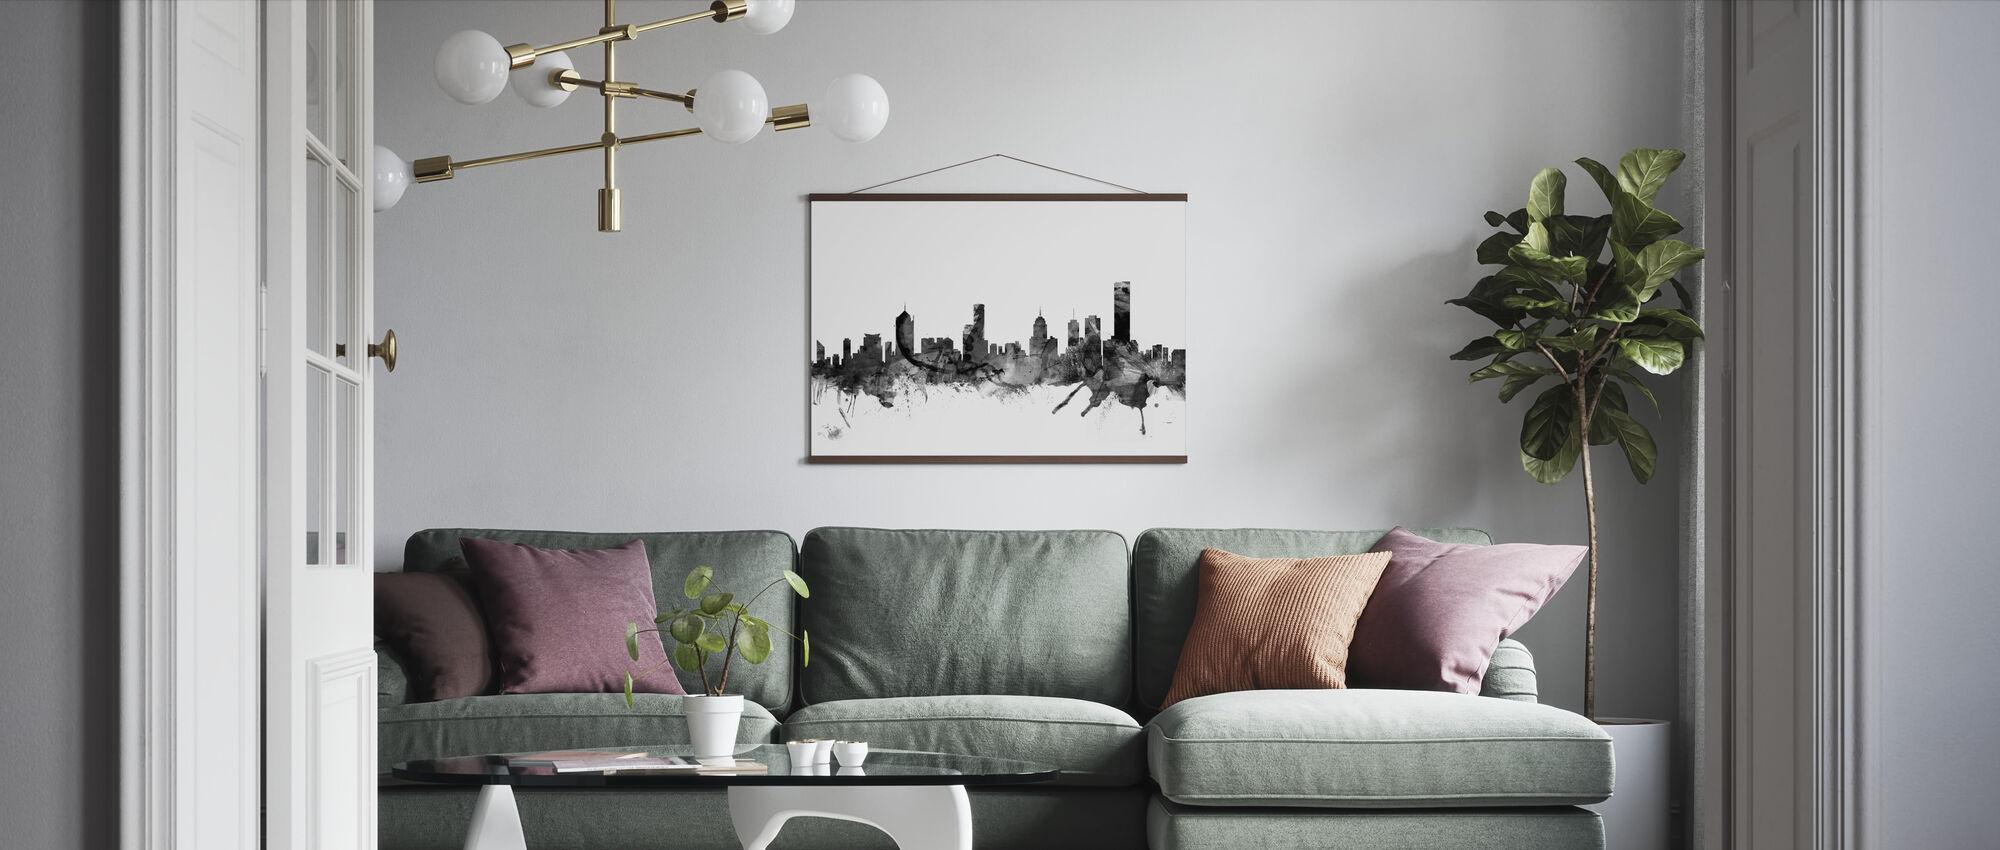 Melbourne Skyline Svart - Plakat - Stue